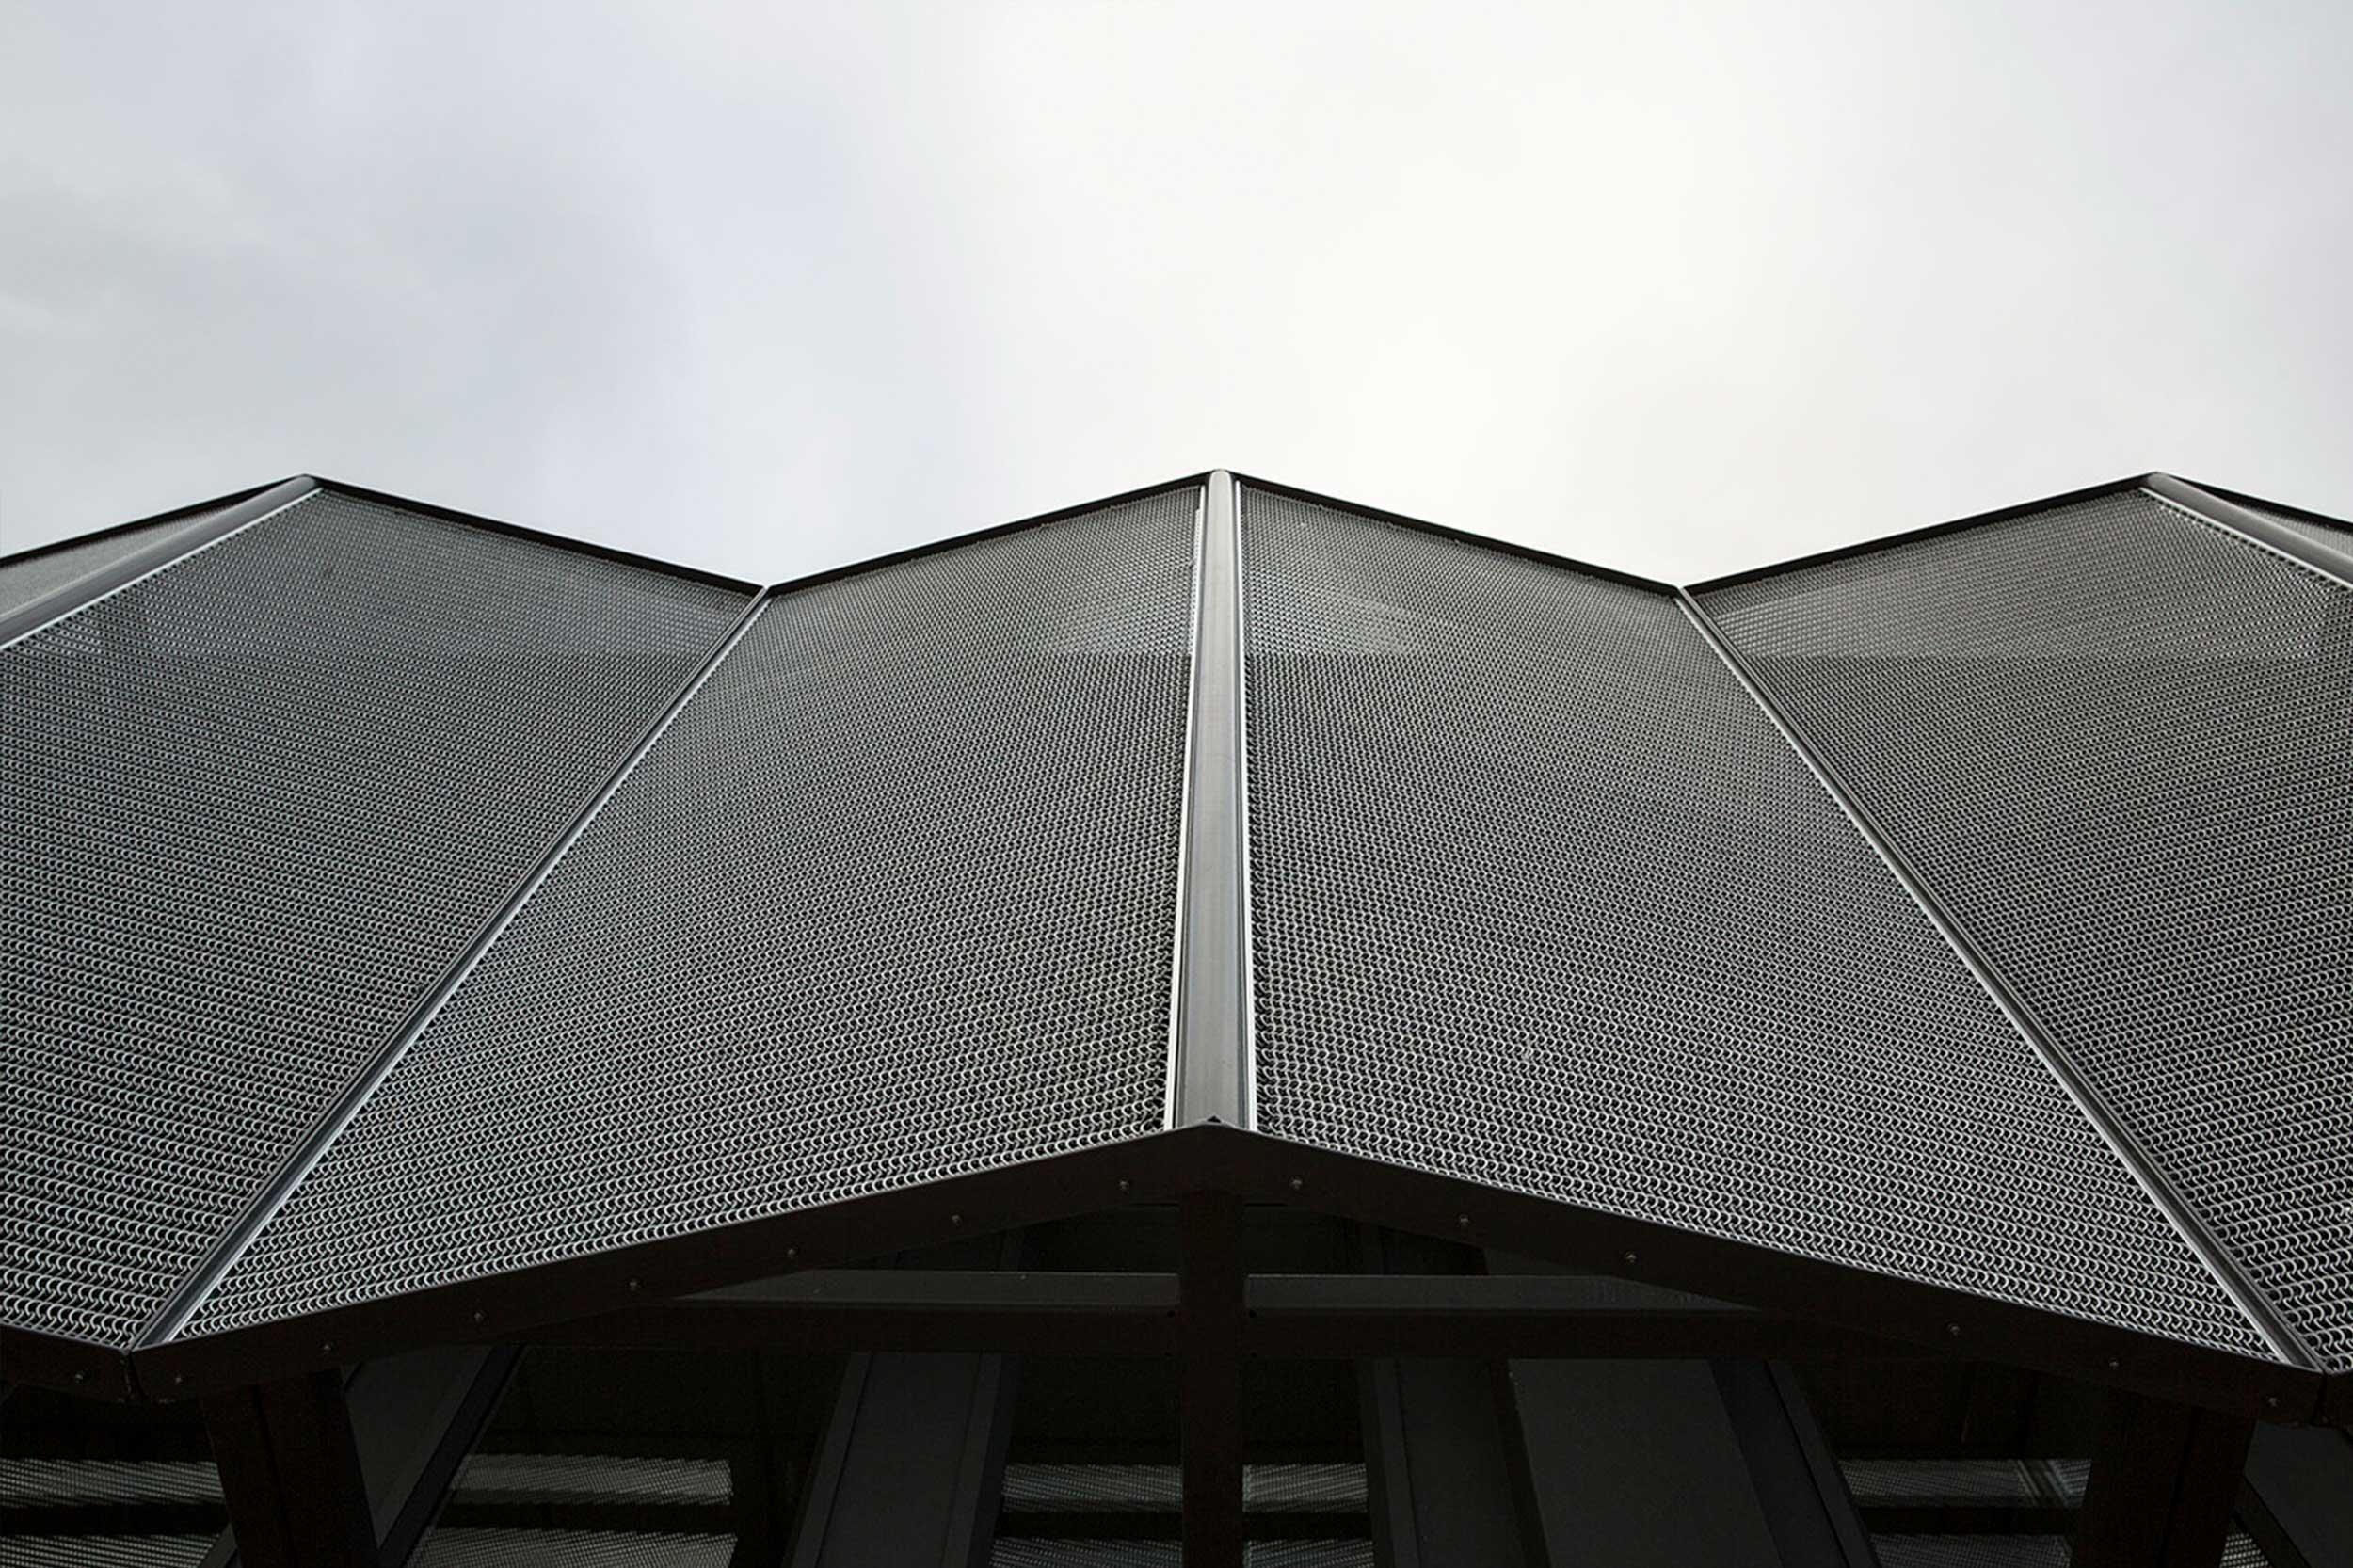 Kaynemaile mesh solar screening for Arthur Holmes Building